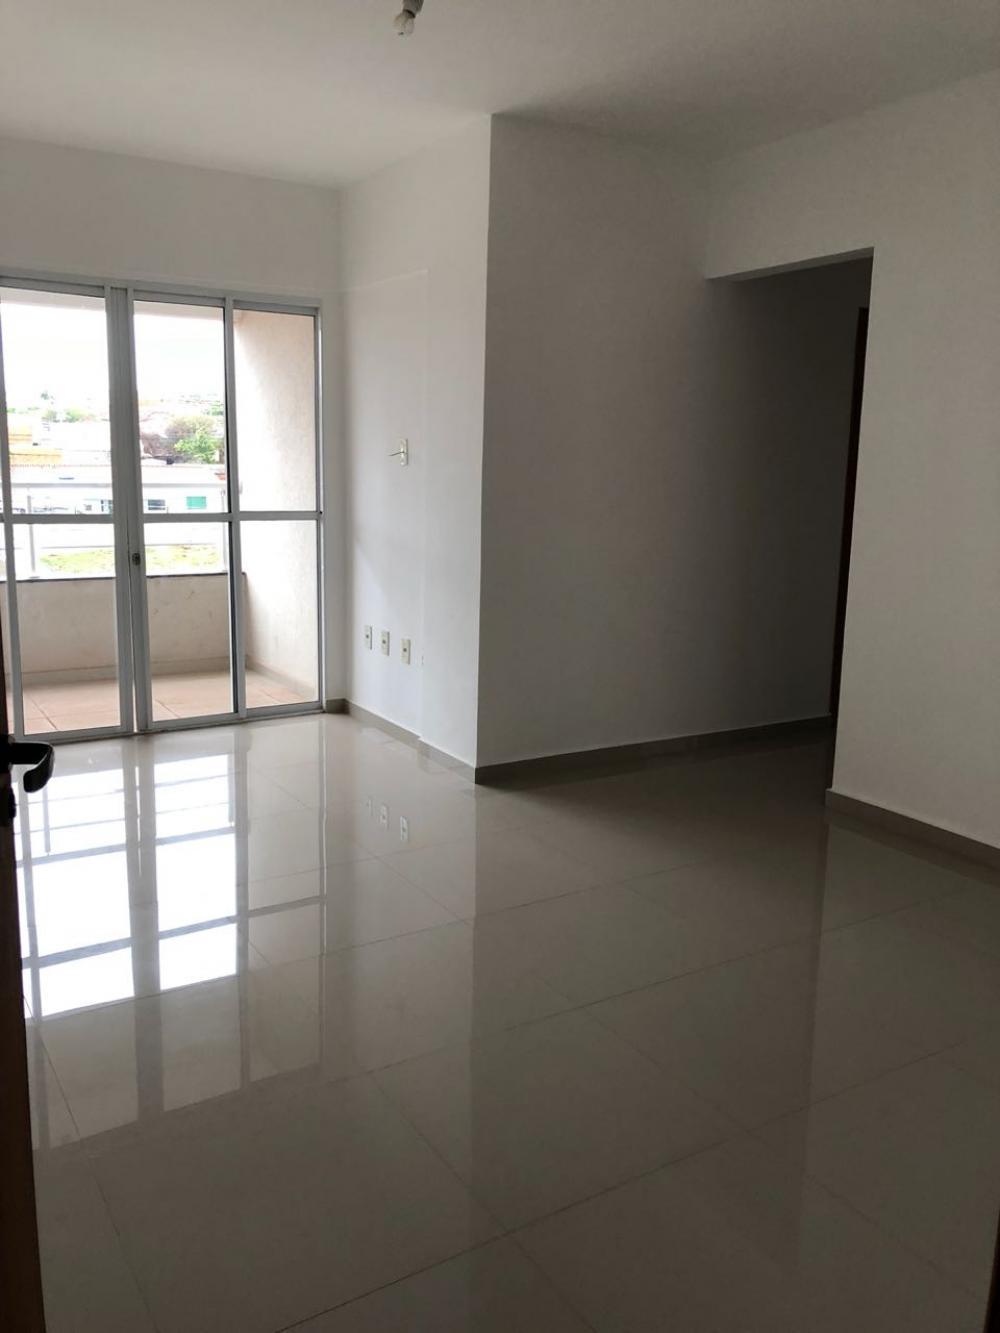 Sao Jose do Rio Preto Apartamento Venda R$270.000,00 Condominio R$180,00 3 Dormitorios 2 Vagas Area construida 86.50m2